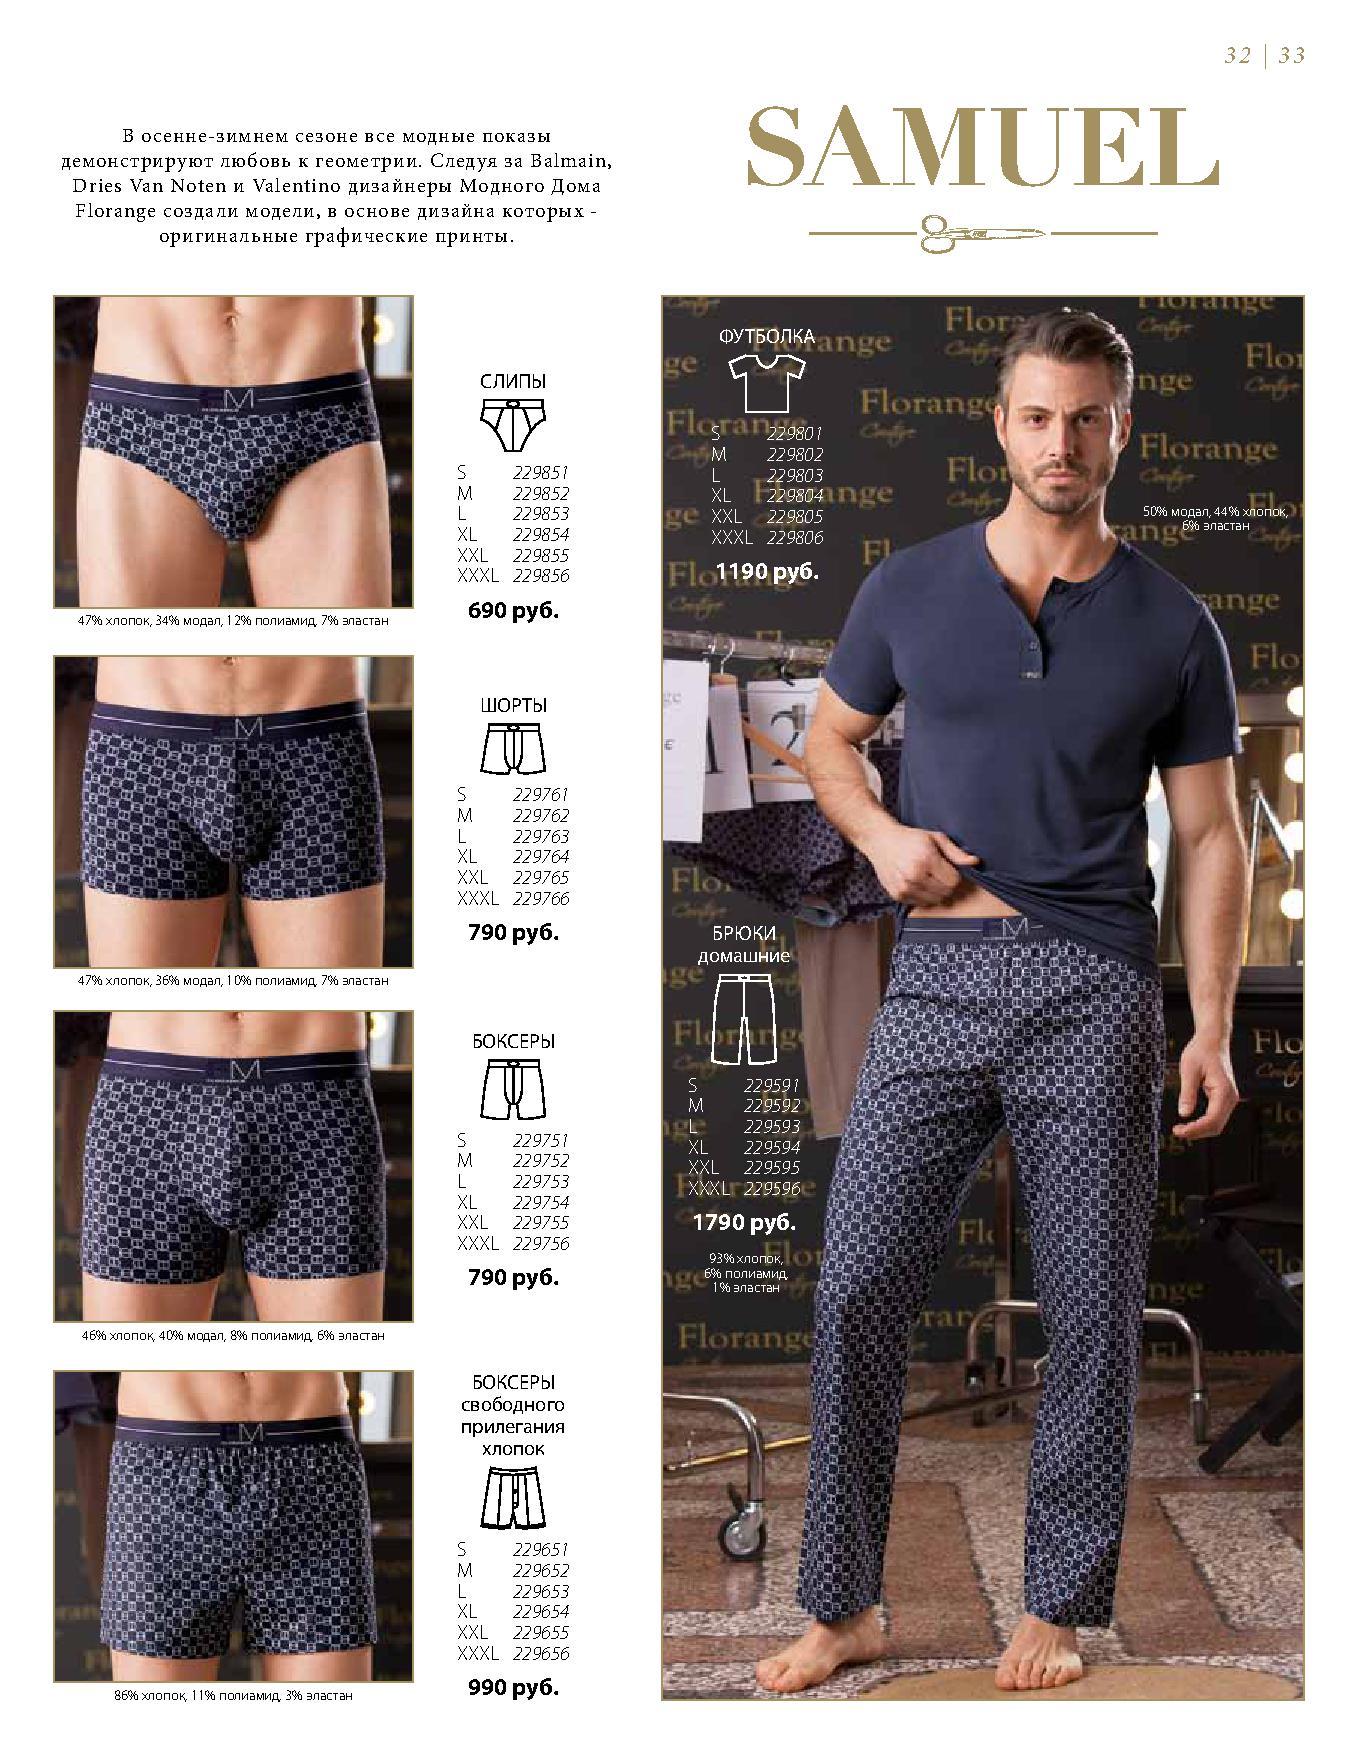 Флоранж комплект Самюель: футболка, брюки, боксеры, шорты, слипы